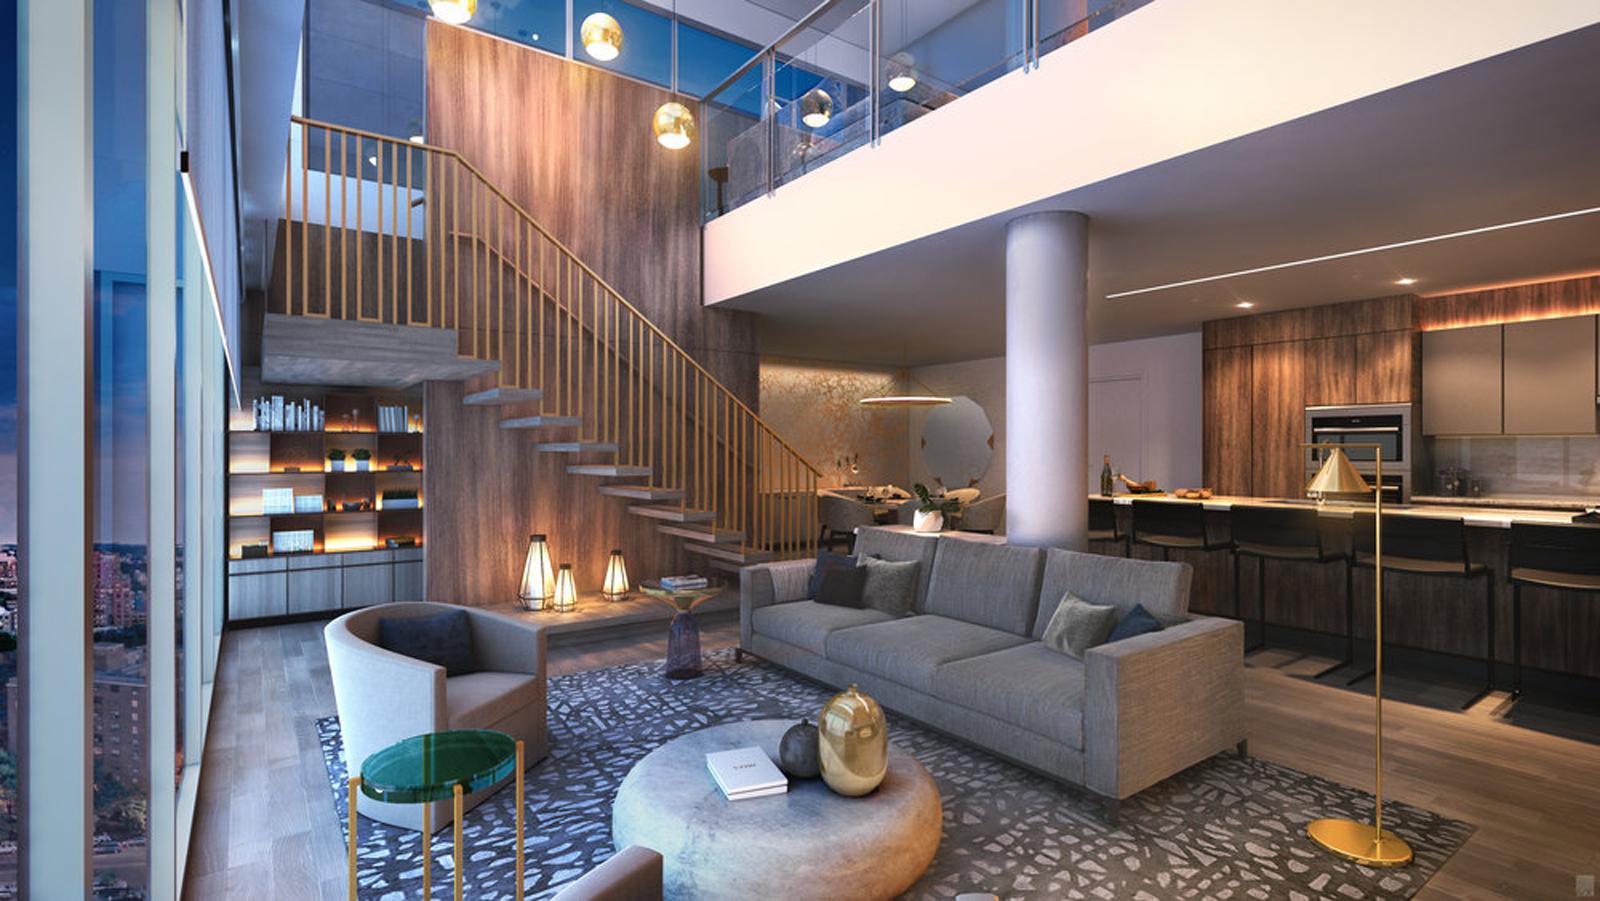 Tangram House 133 15 39th Avenue Nyc Condo Apartments